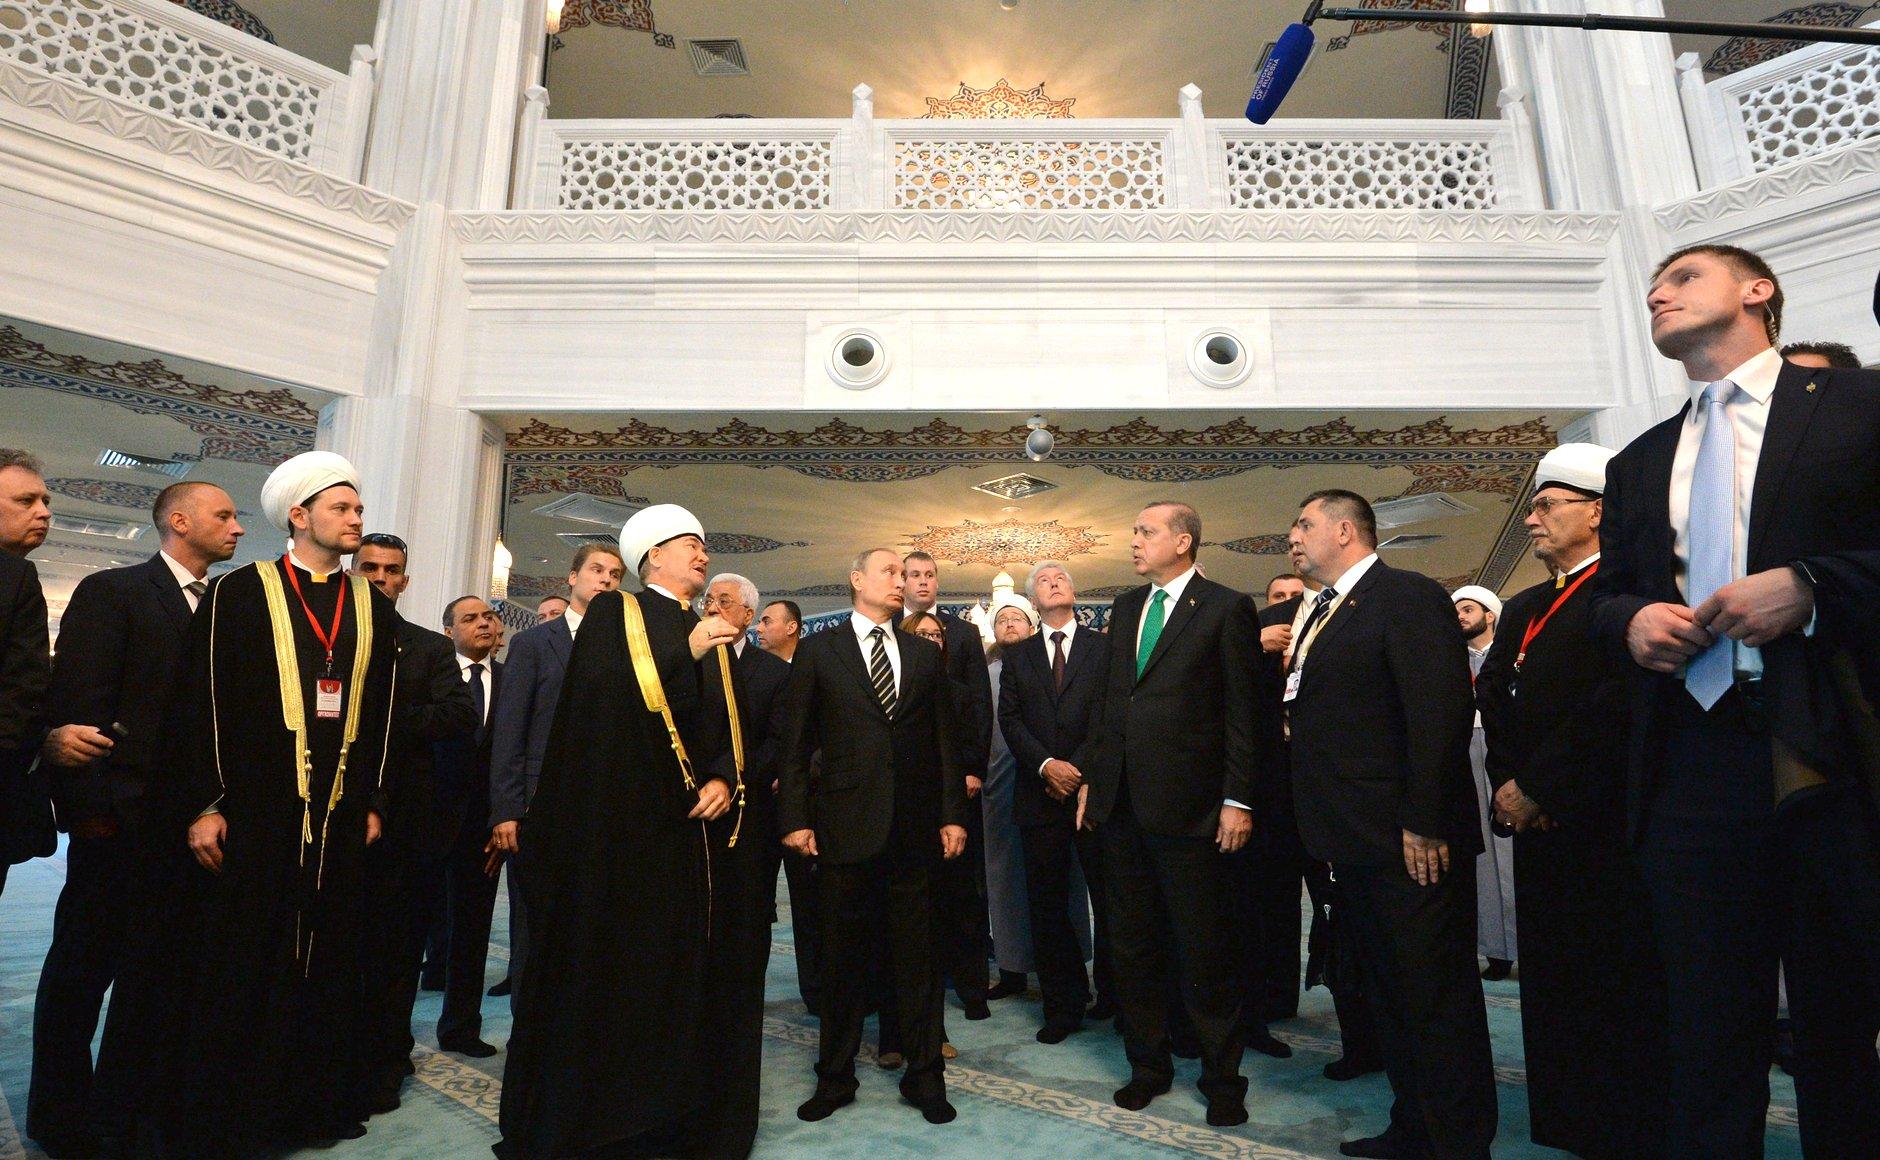 Vladimir Putin and Recep Tayyip Erdoan opened